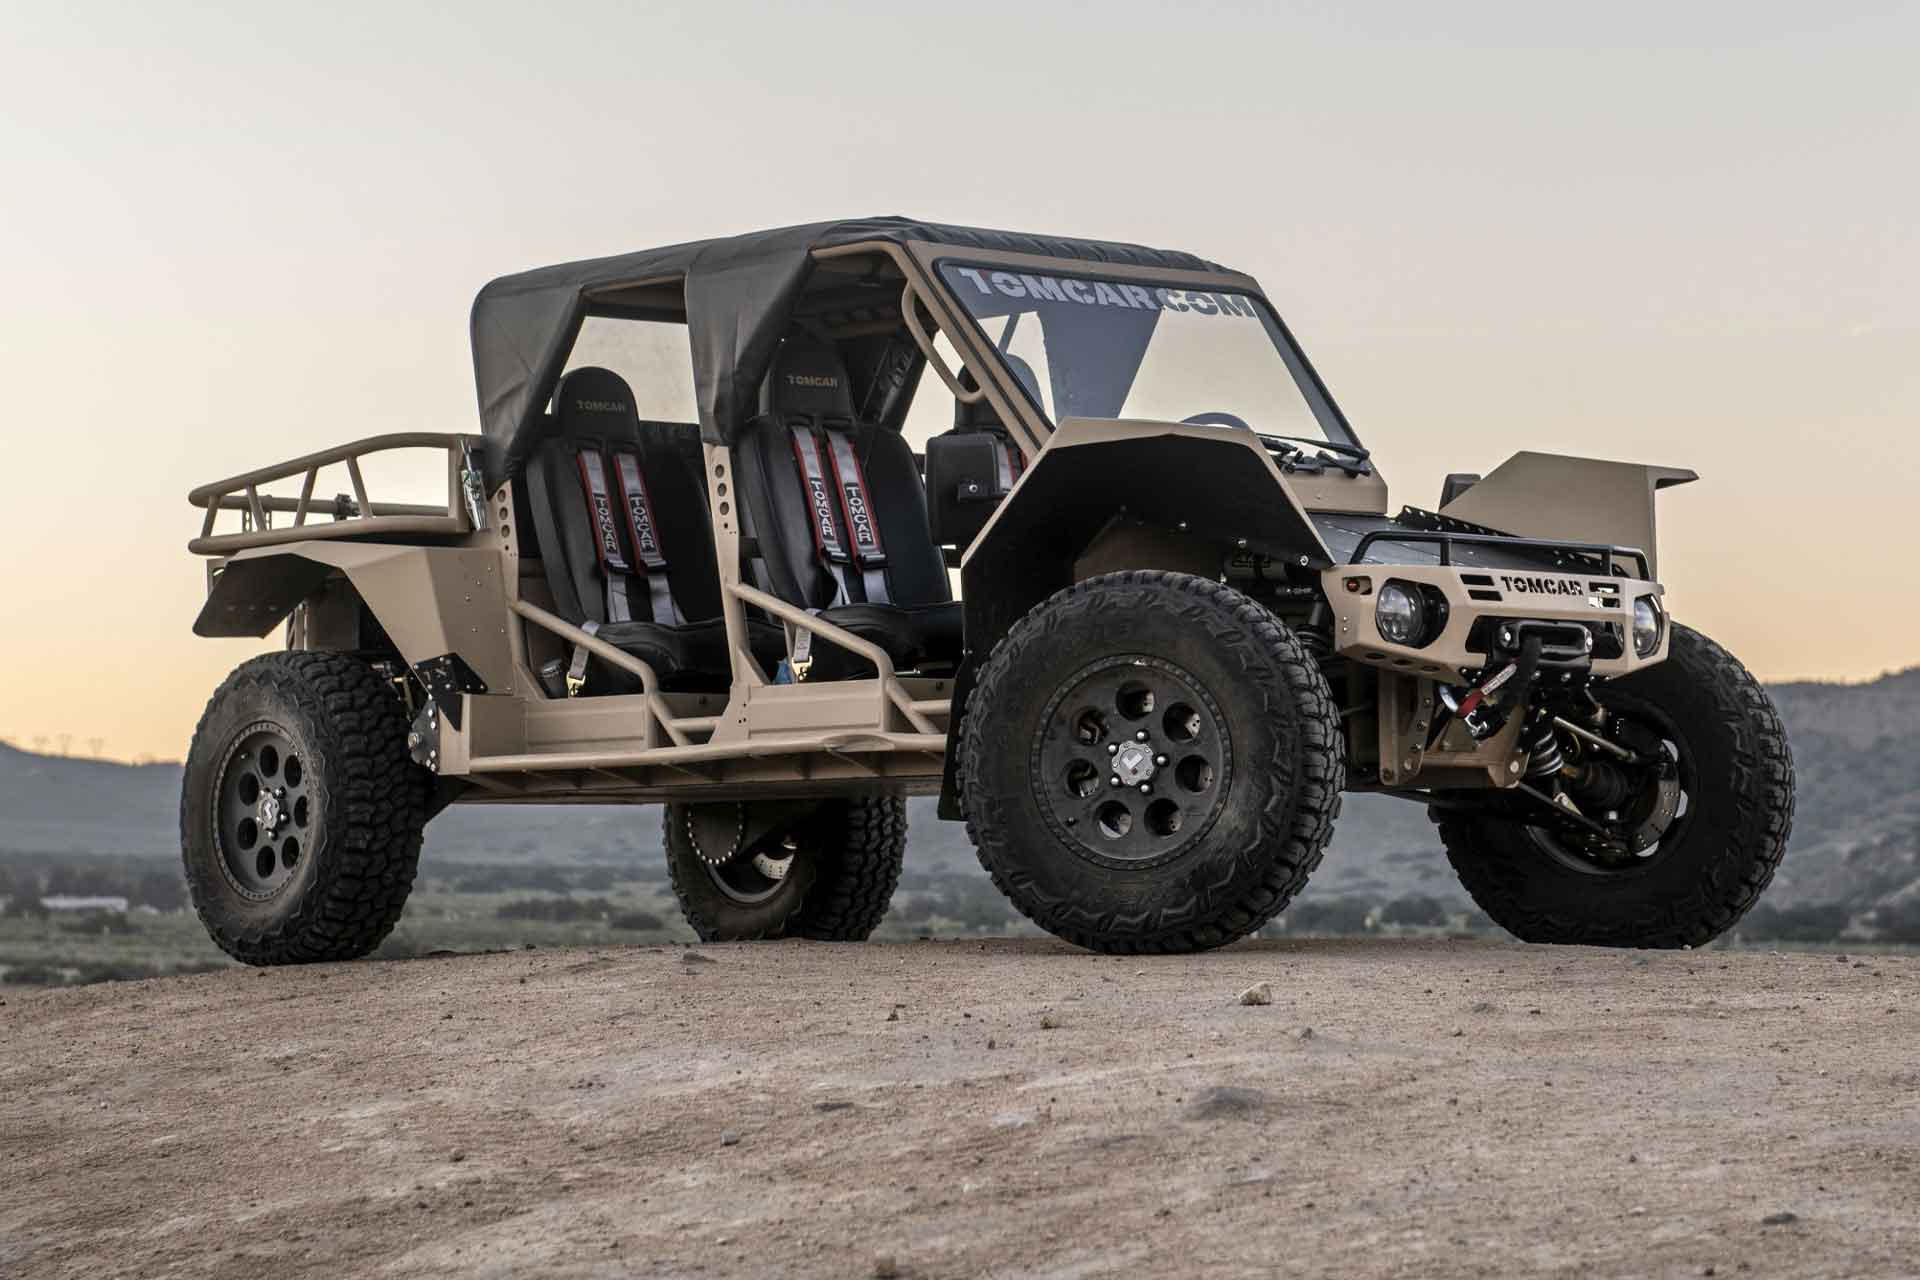 2020 Tomcar TX ATV